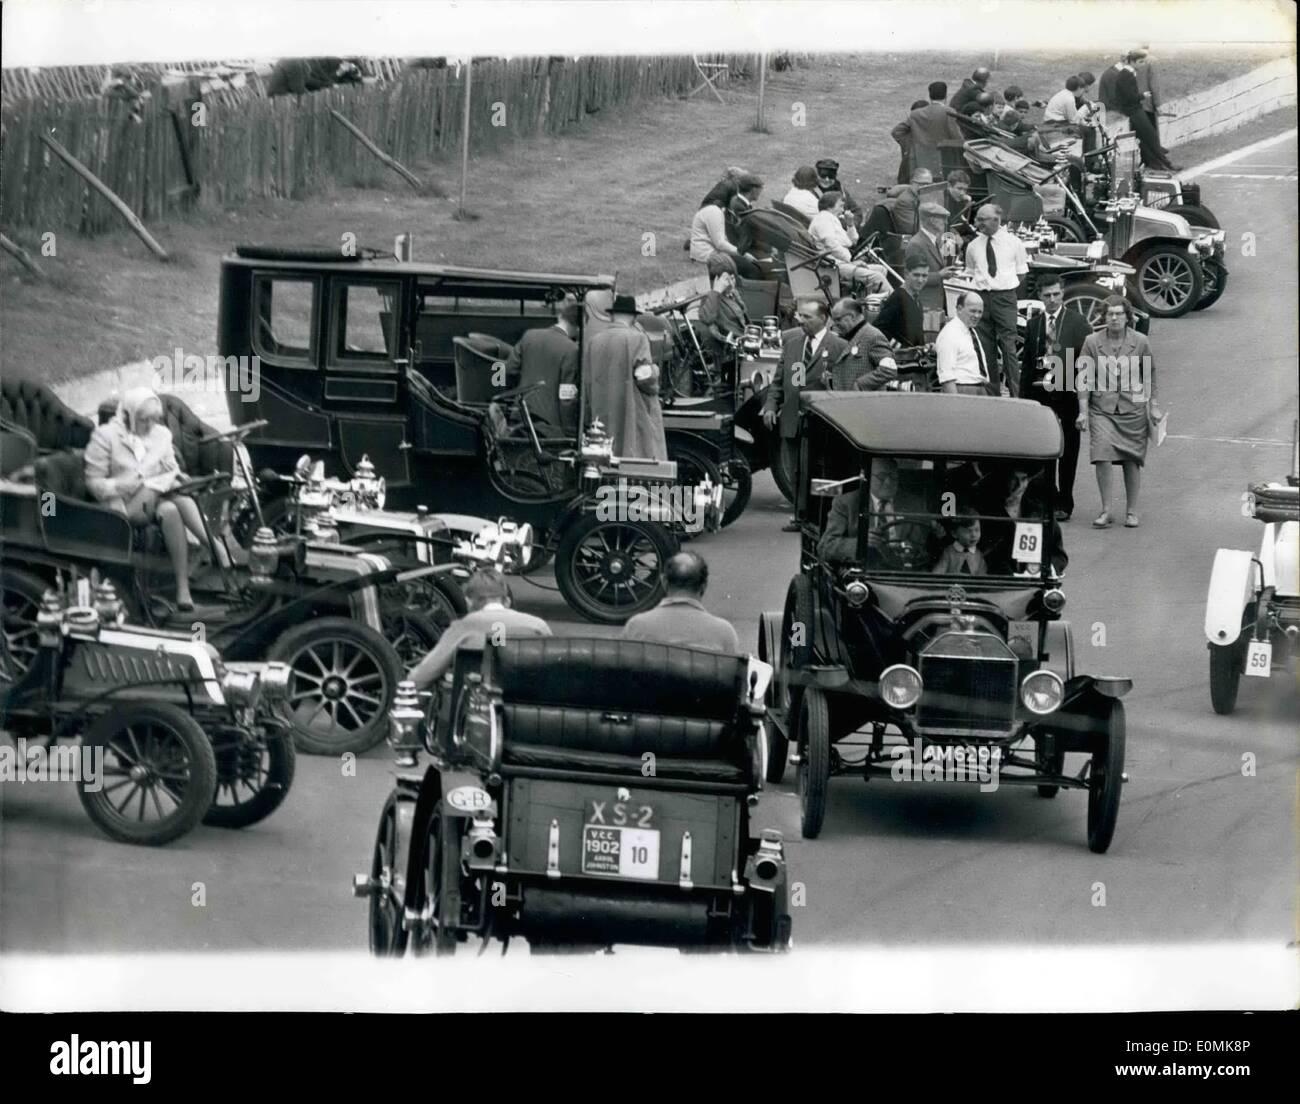 Jul. 07, 1955 - Veteran Car Rally At Crystal Place: A magnificent ...